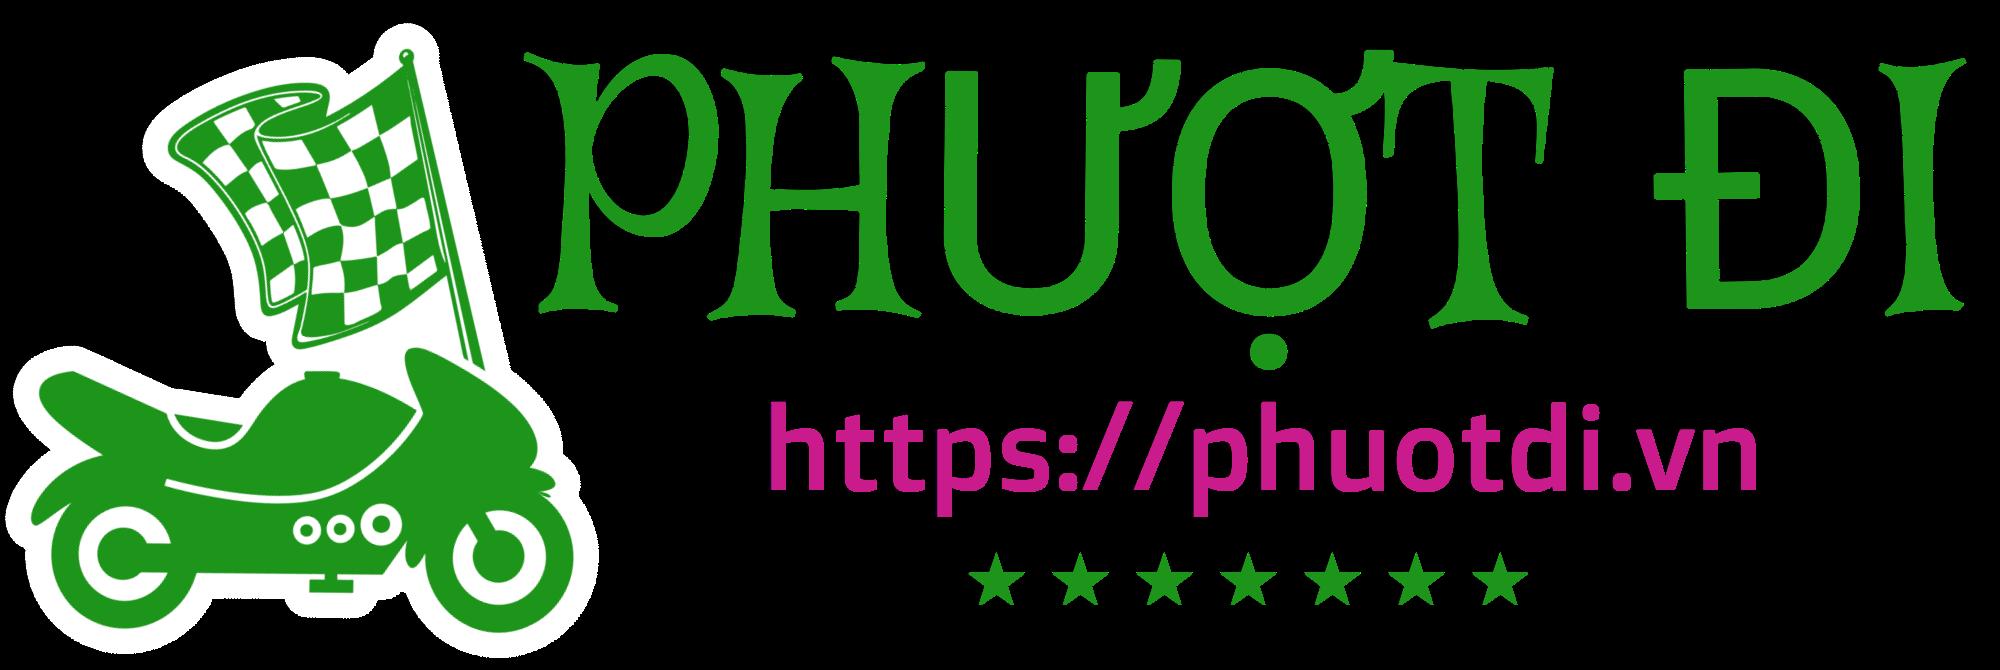 Phuotdi.vn